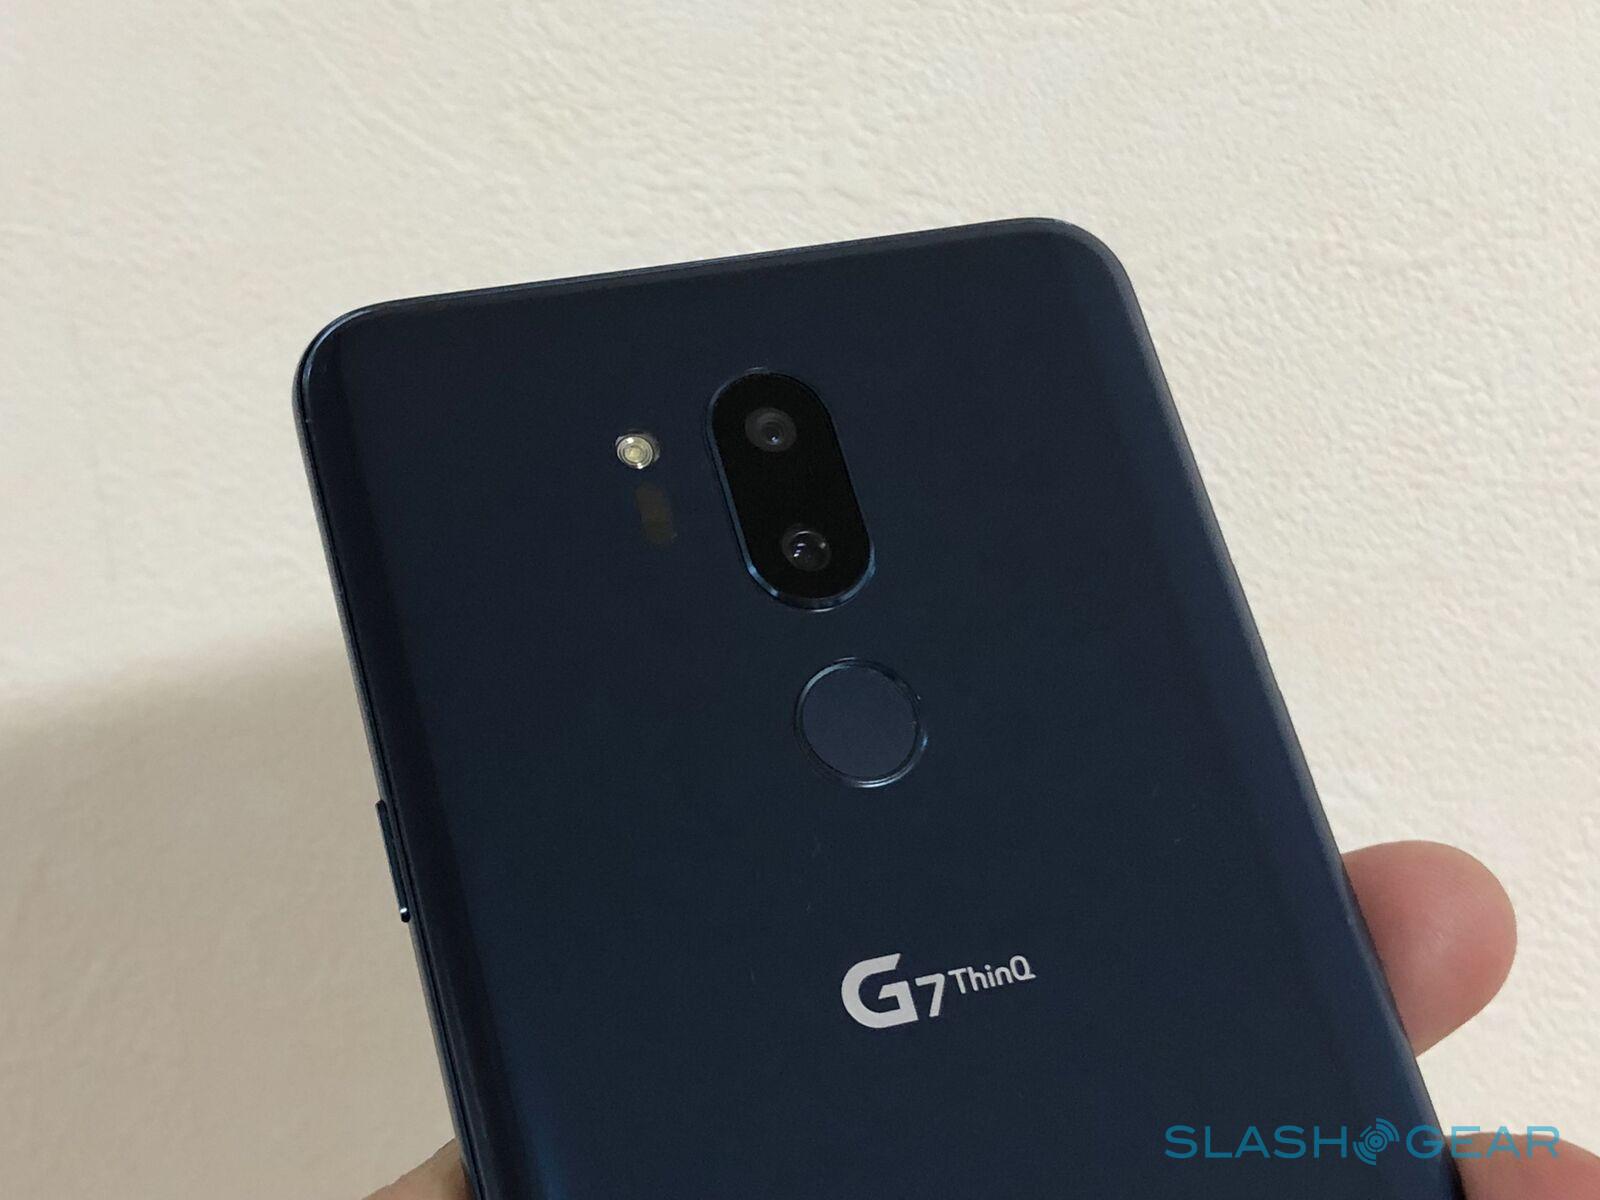 LG G7 ThinQ Review: sounds better than it looks - SlashGear